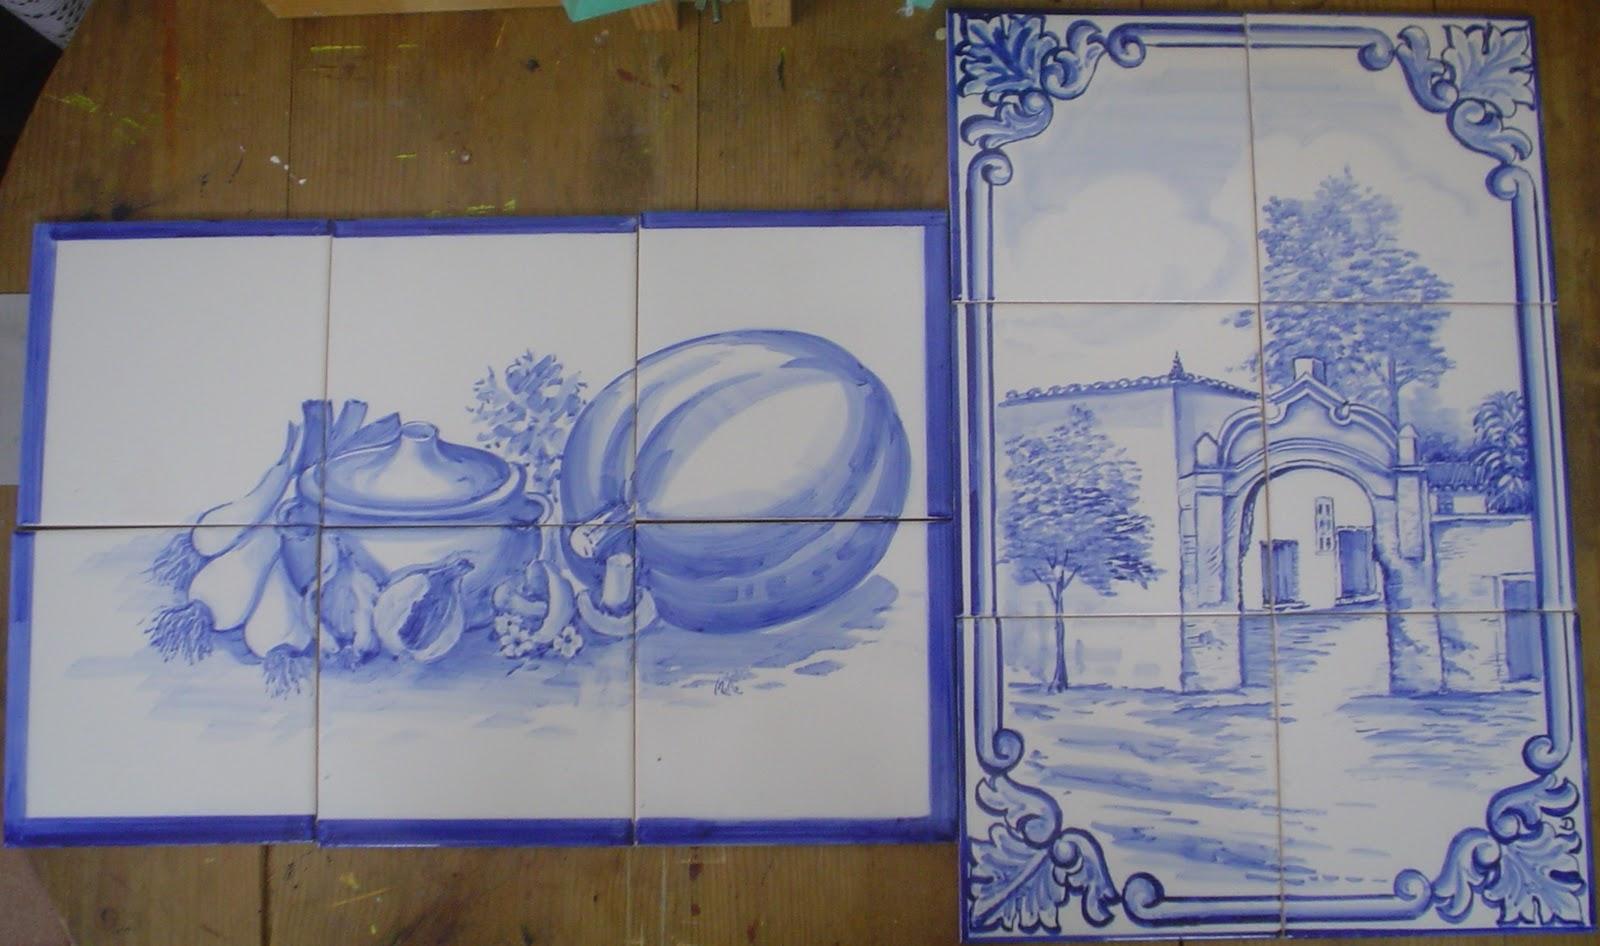 Azulejos pintados m o af curso de inicia o pintura - Pintura de azulejos ...